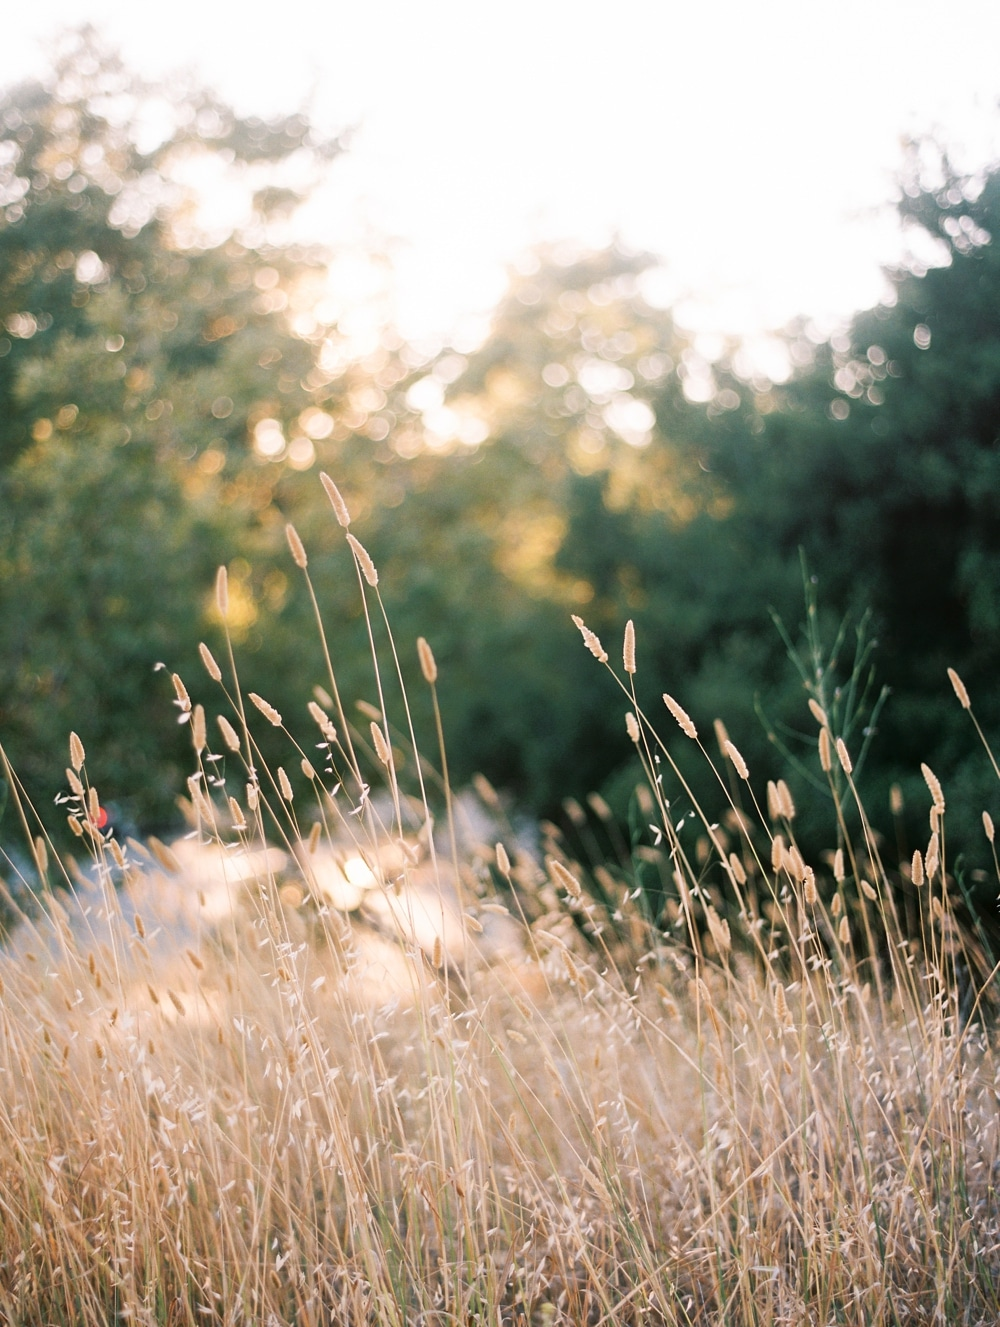 Kristin-La-Voie-Photography-california-wedding-photographer-dog-session-rancho-san-antonio-los-altos-56